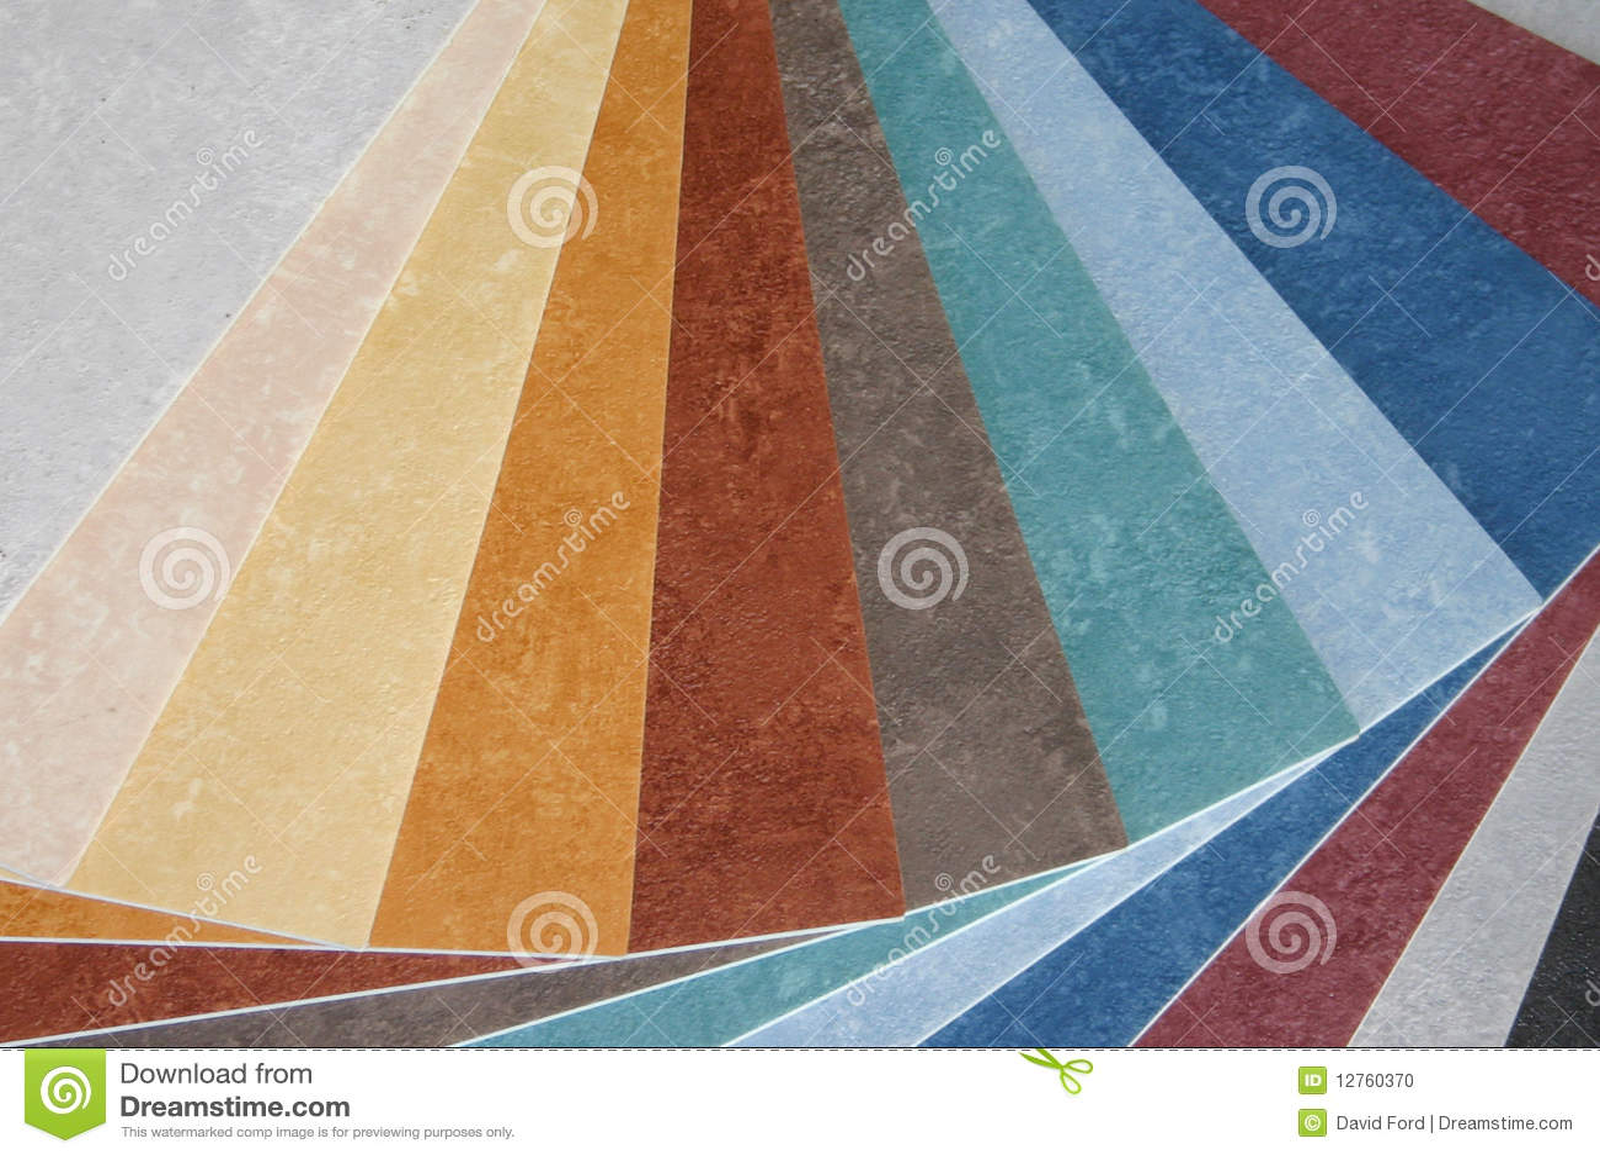 kitchen vinyl round table for 6 地板乙烯基库存照片 图片包括有目录 显示 内部 范例 地板 厨房 上色显示纹理乙烯基的陈列品选择